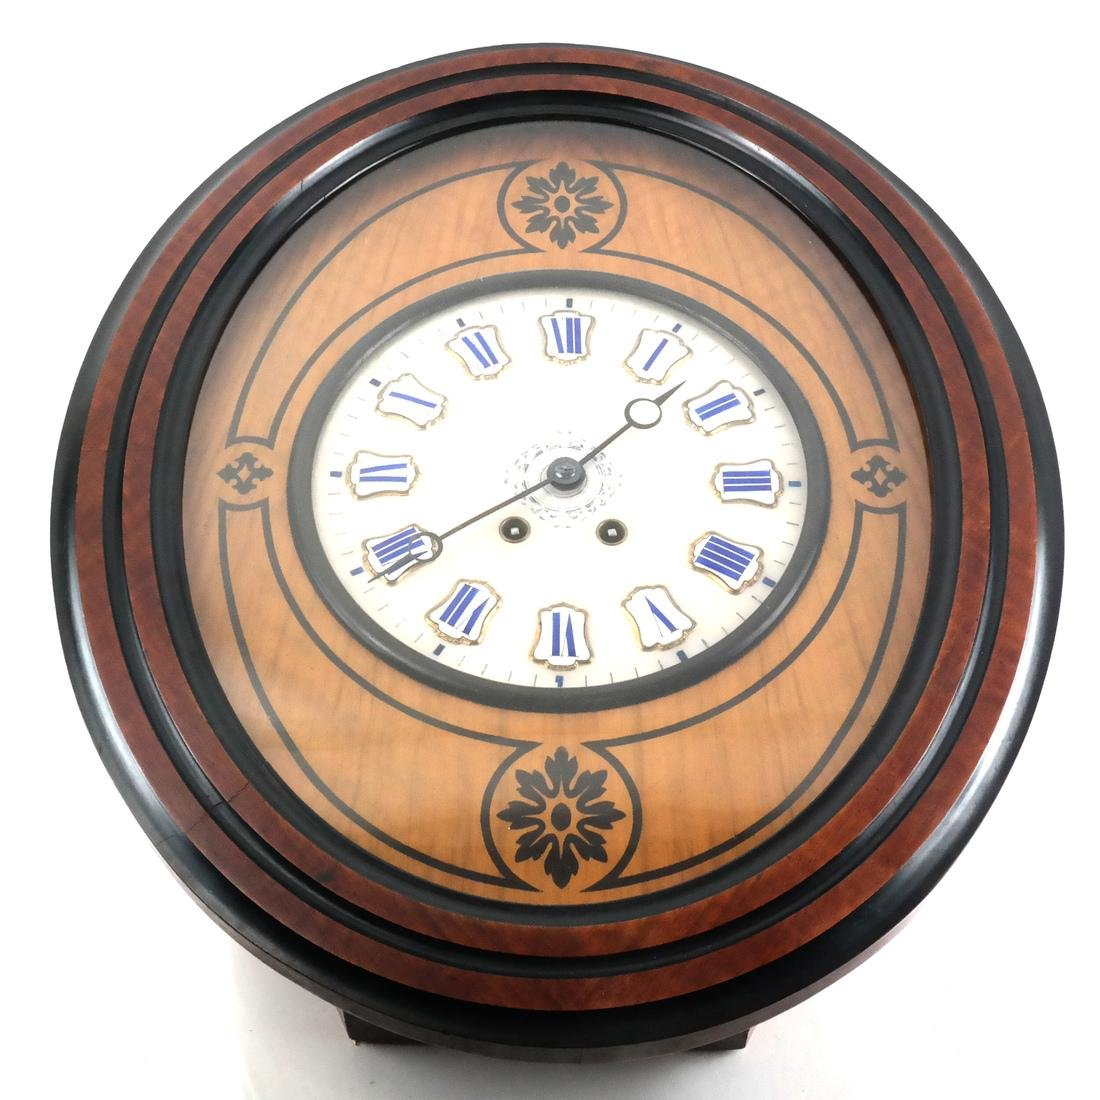 Biedermeier-Style Oval Regulator Clock